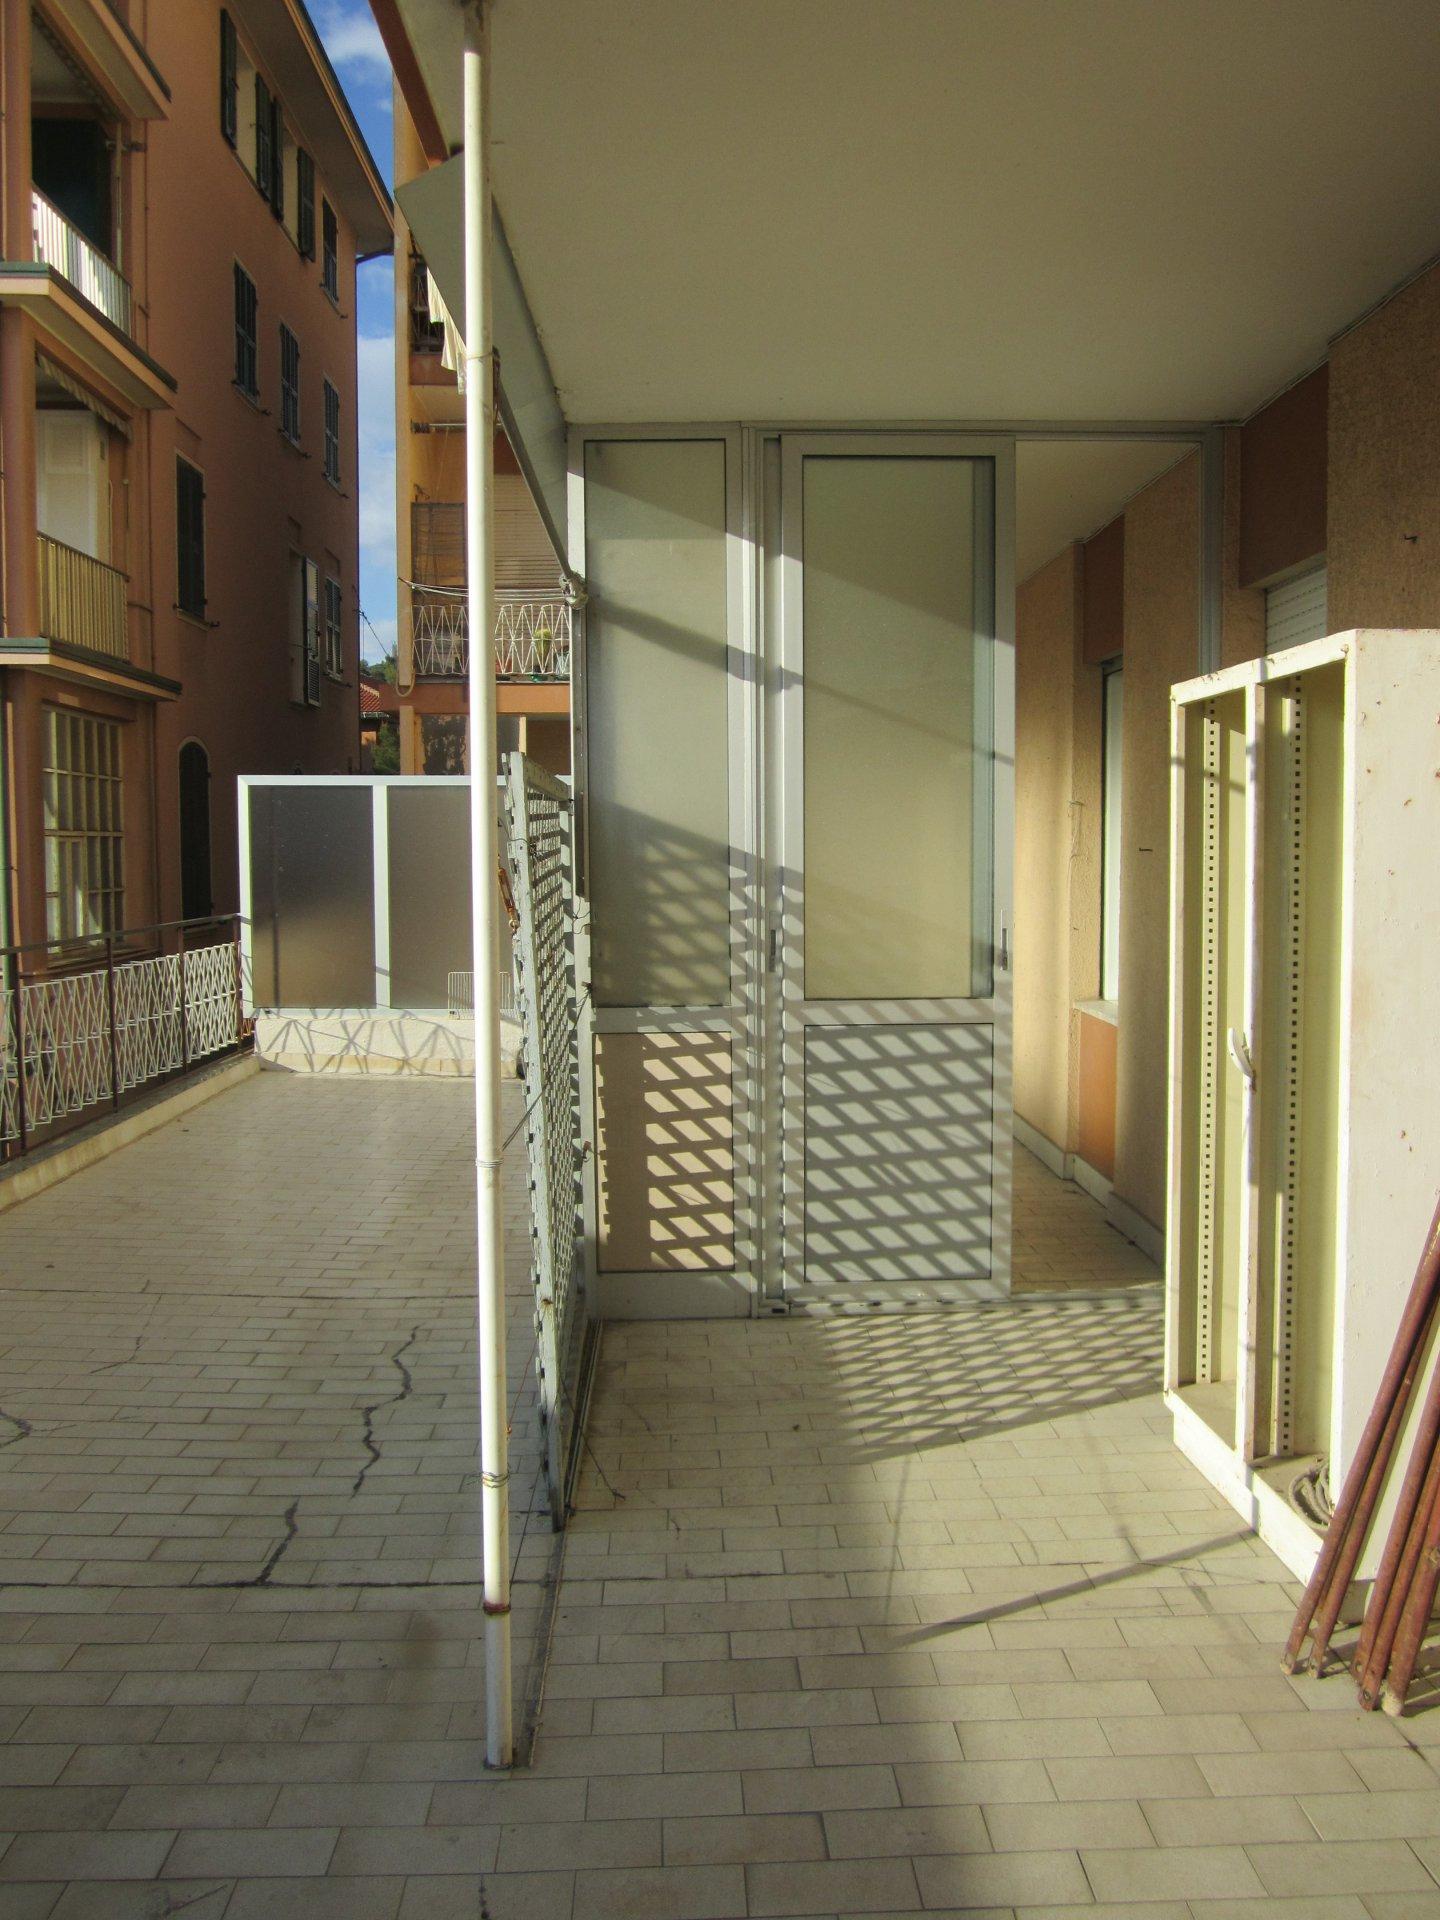 Sale Apartment - Bordighera - Italy